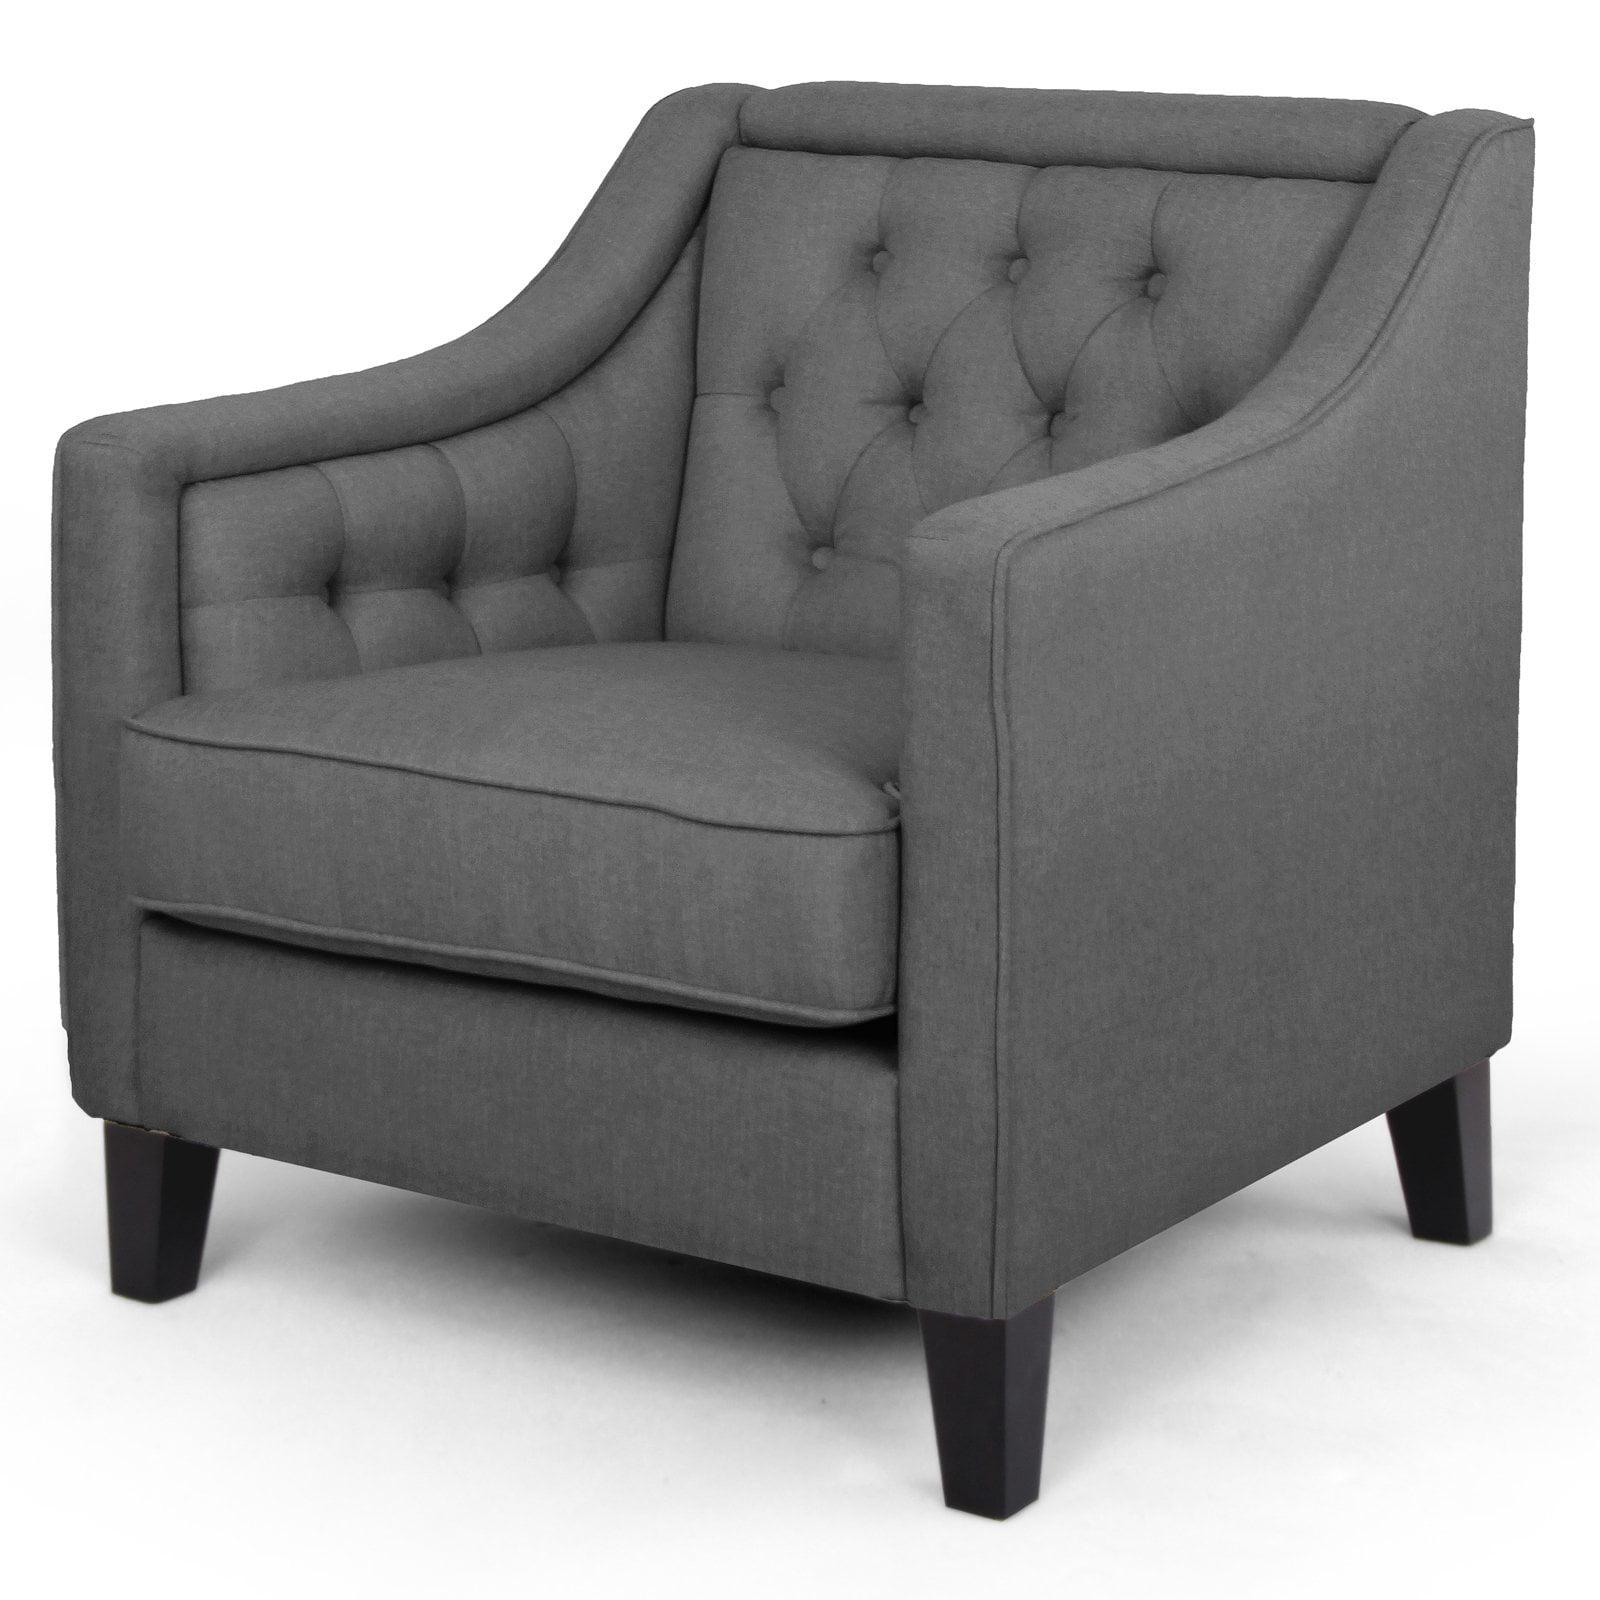 Baxton Studio Vienna Armchair by Wholesale Interiors